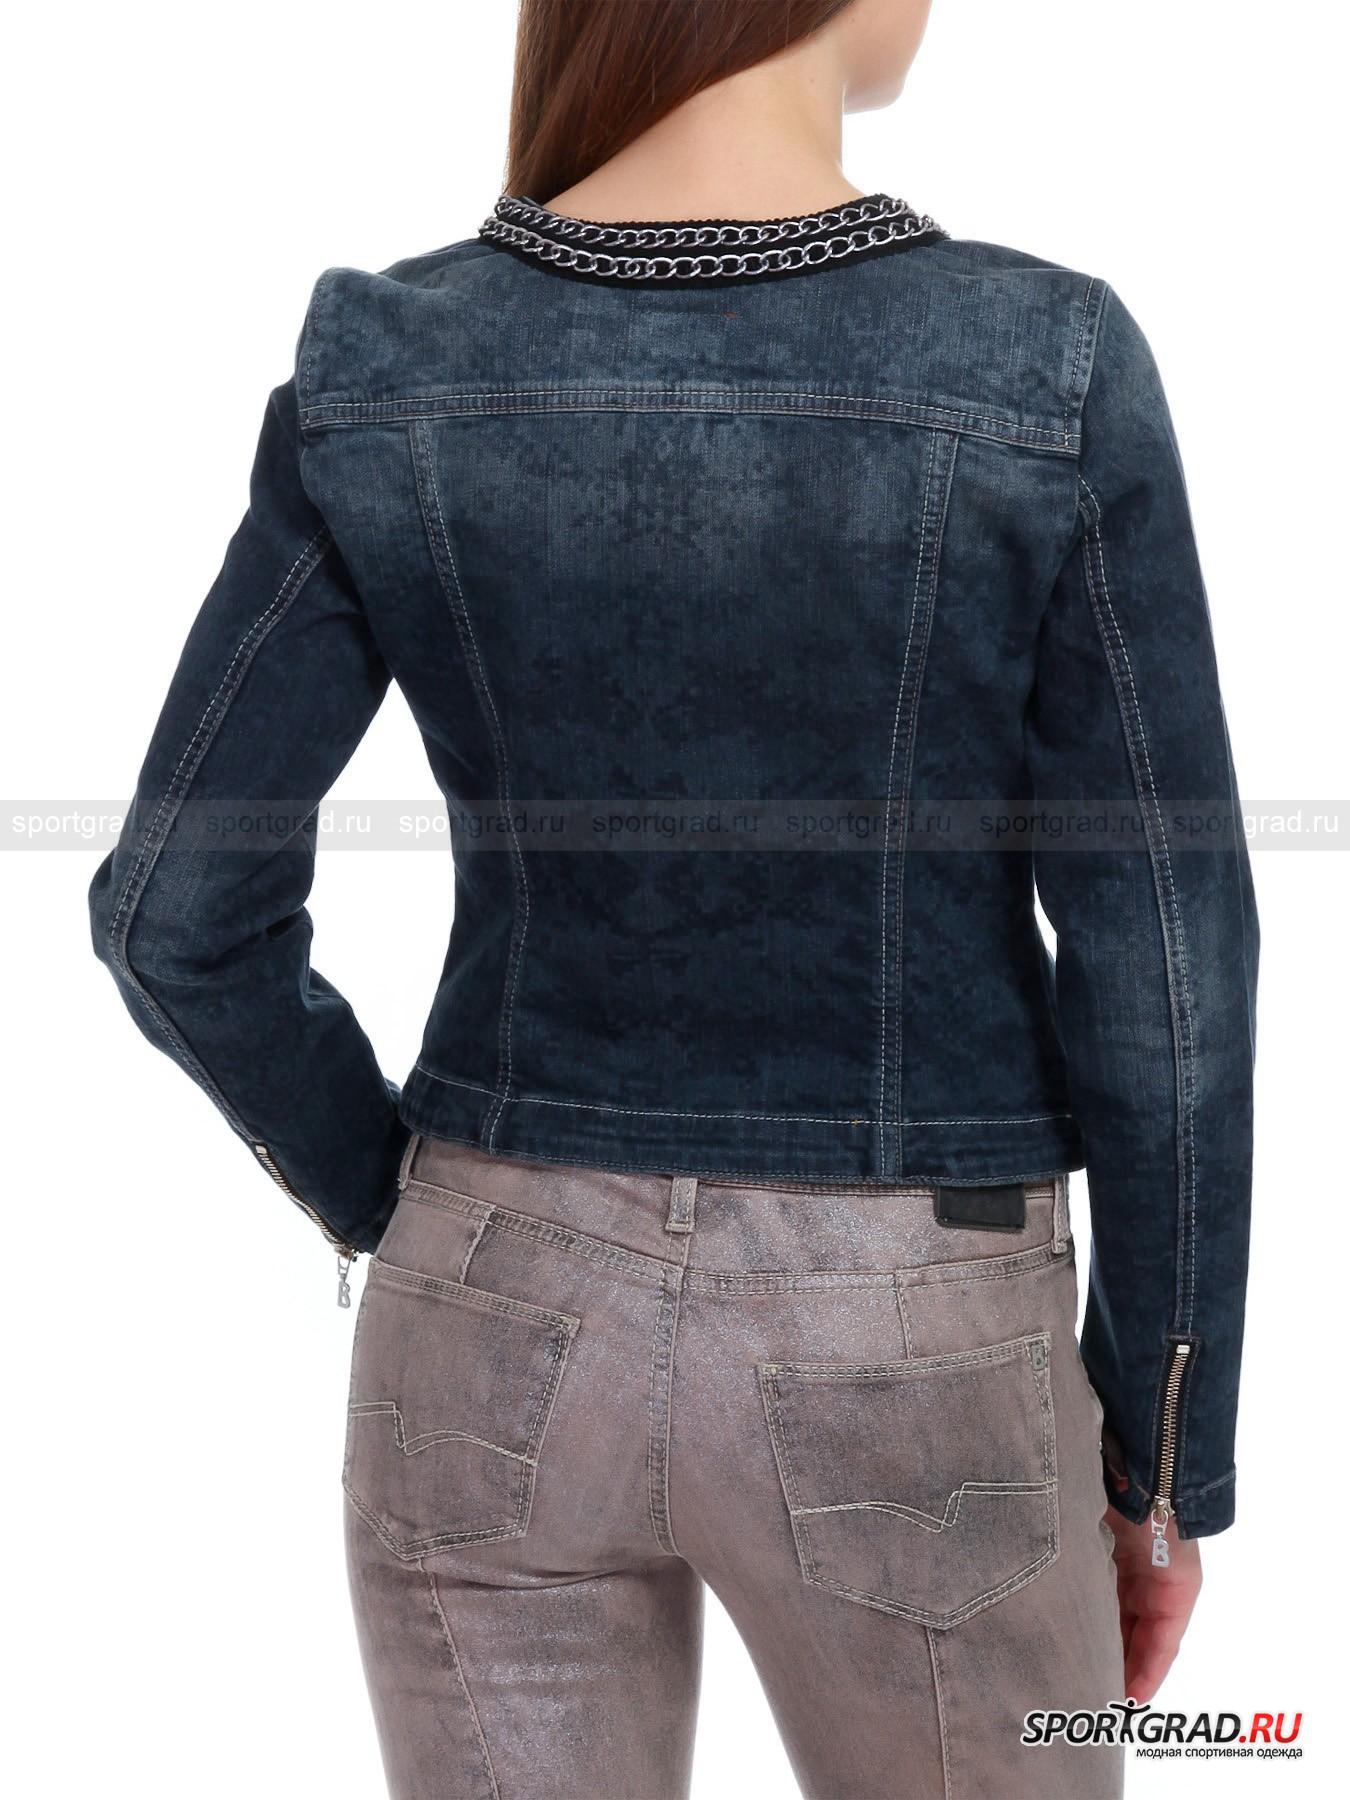 Куртка-жакет женская STELLA BOGNER JEANS от Спортград